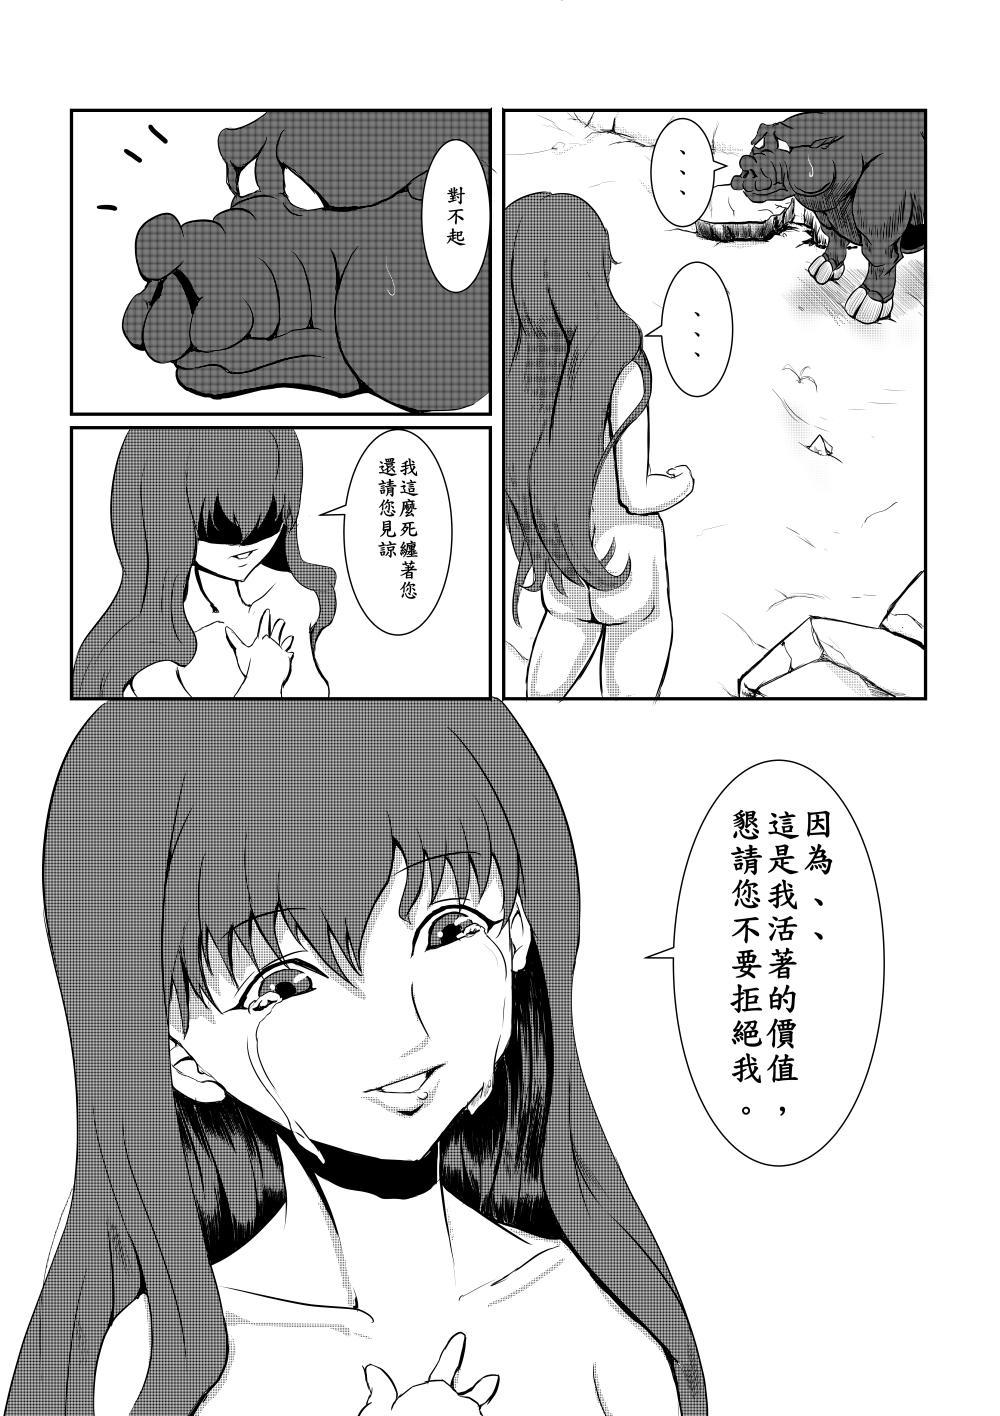 Maou Yuusha - Kachiku Kiki 3 62